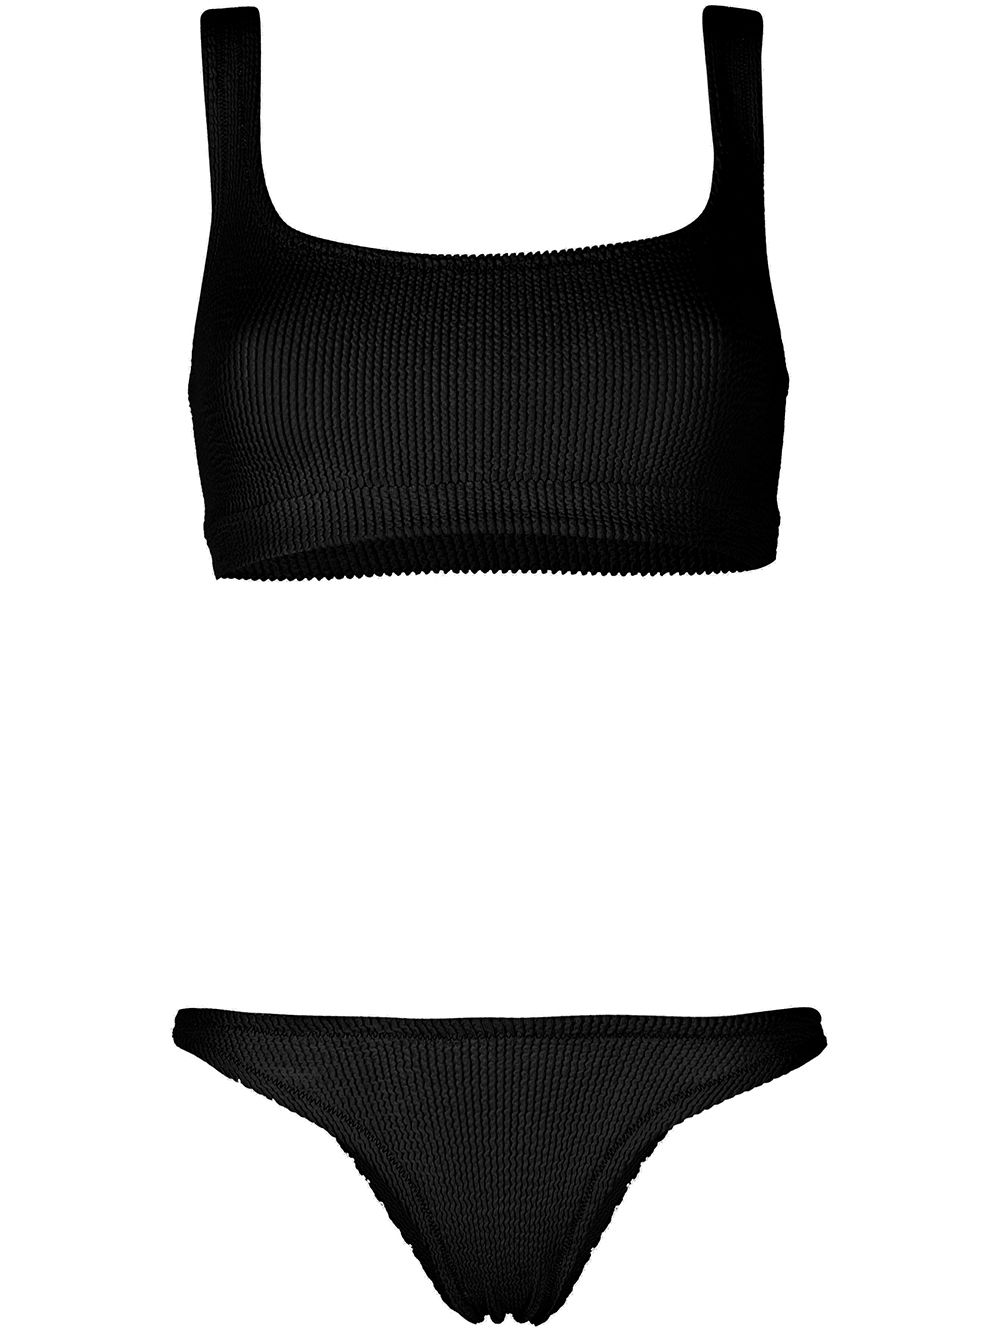 Black polyamide seersucker bikini  REINA OLGA |  | GINNY BOOBSBLACK